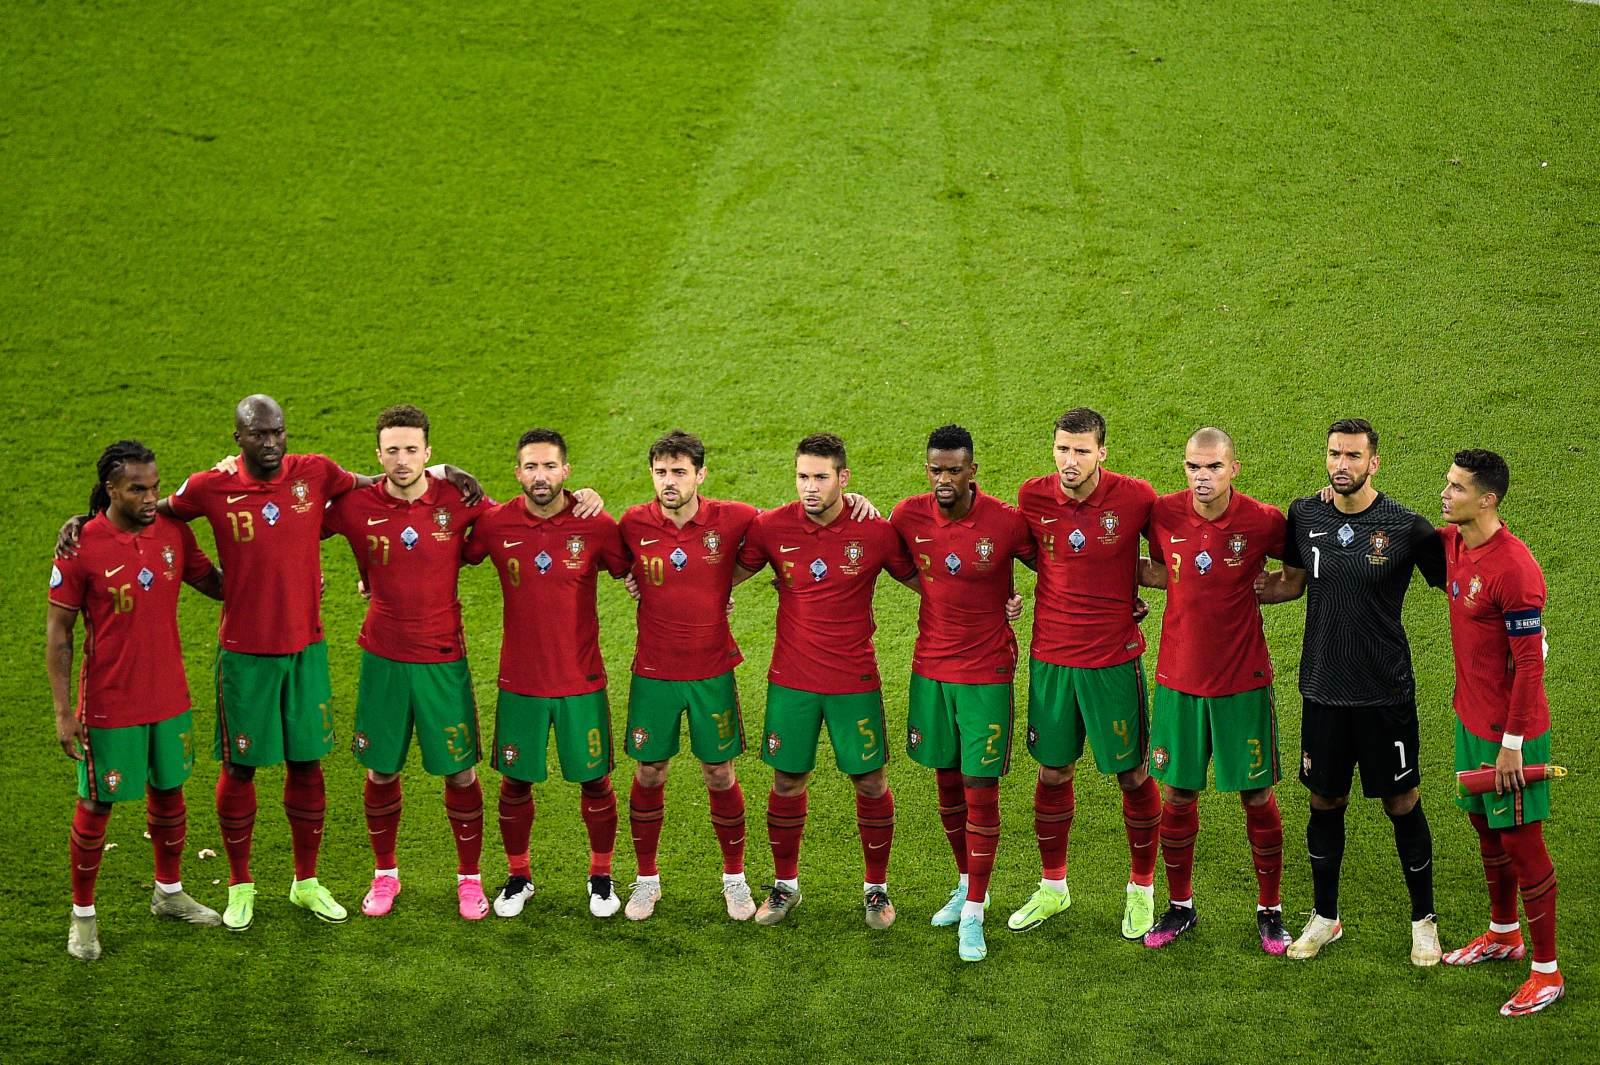 Португалия - Катар - 3:0 (завершён)